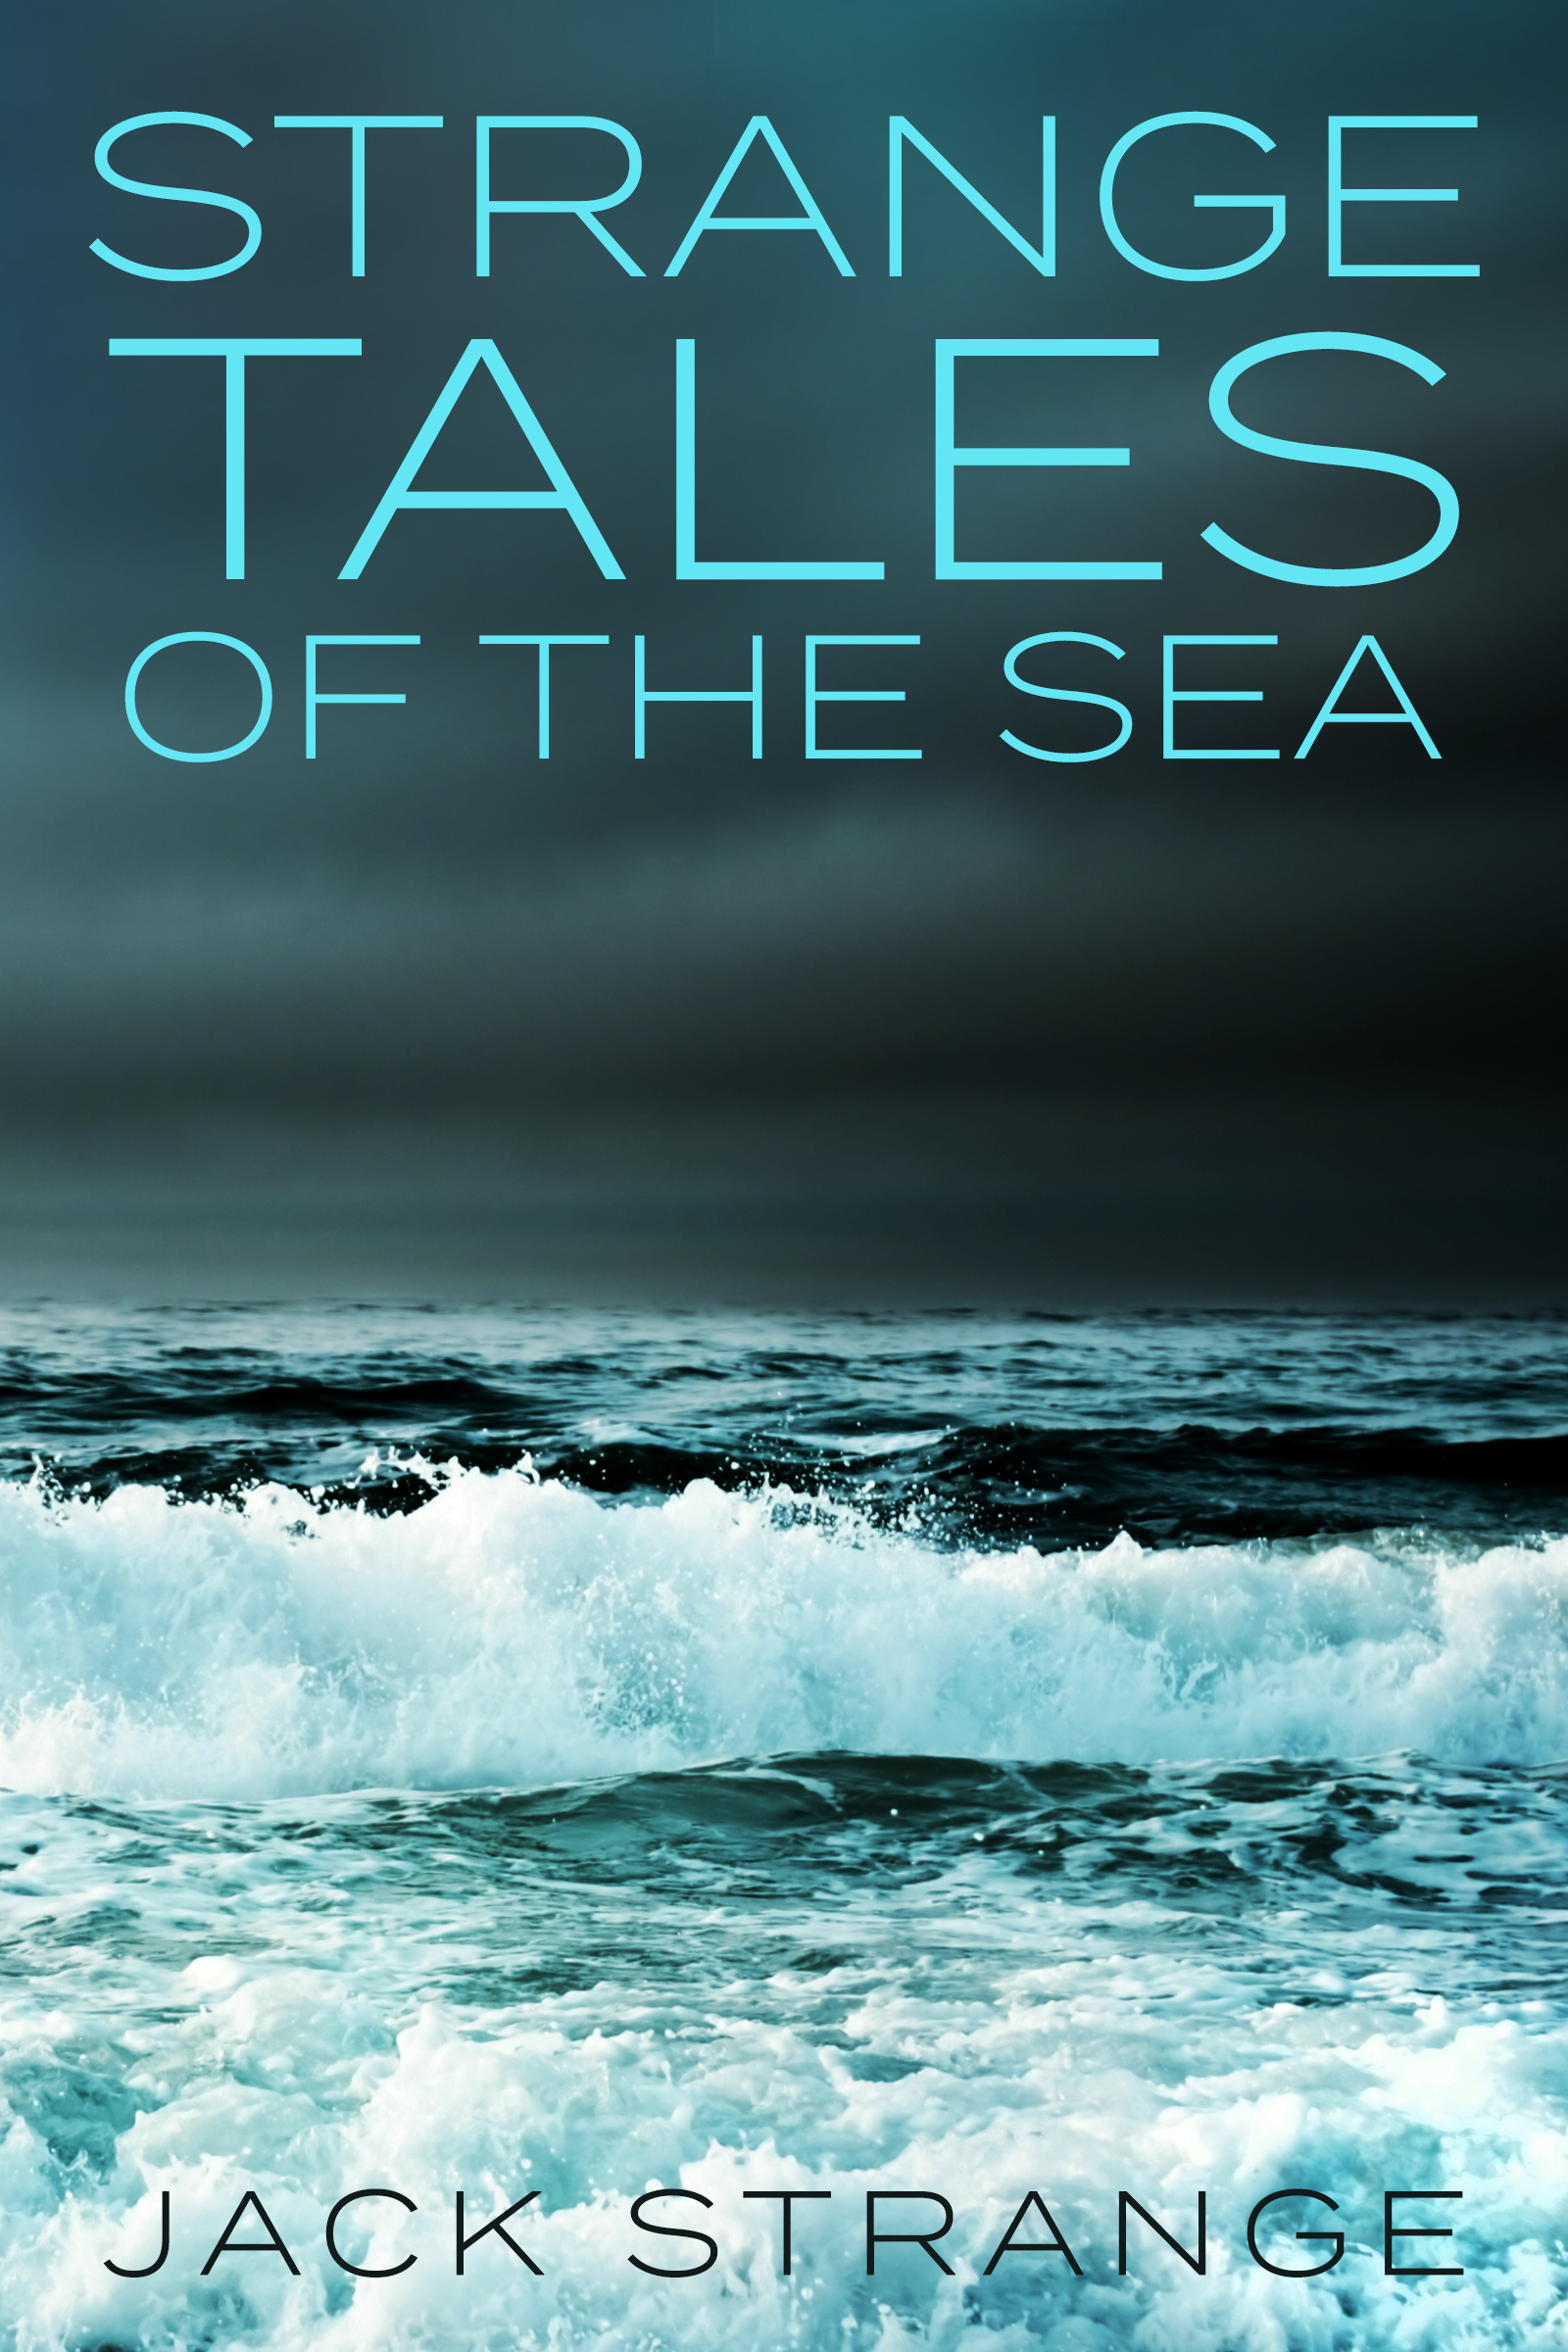 Strange tales of the sea